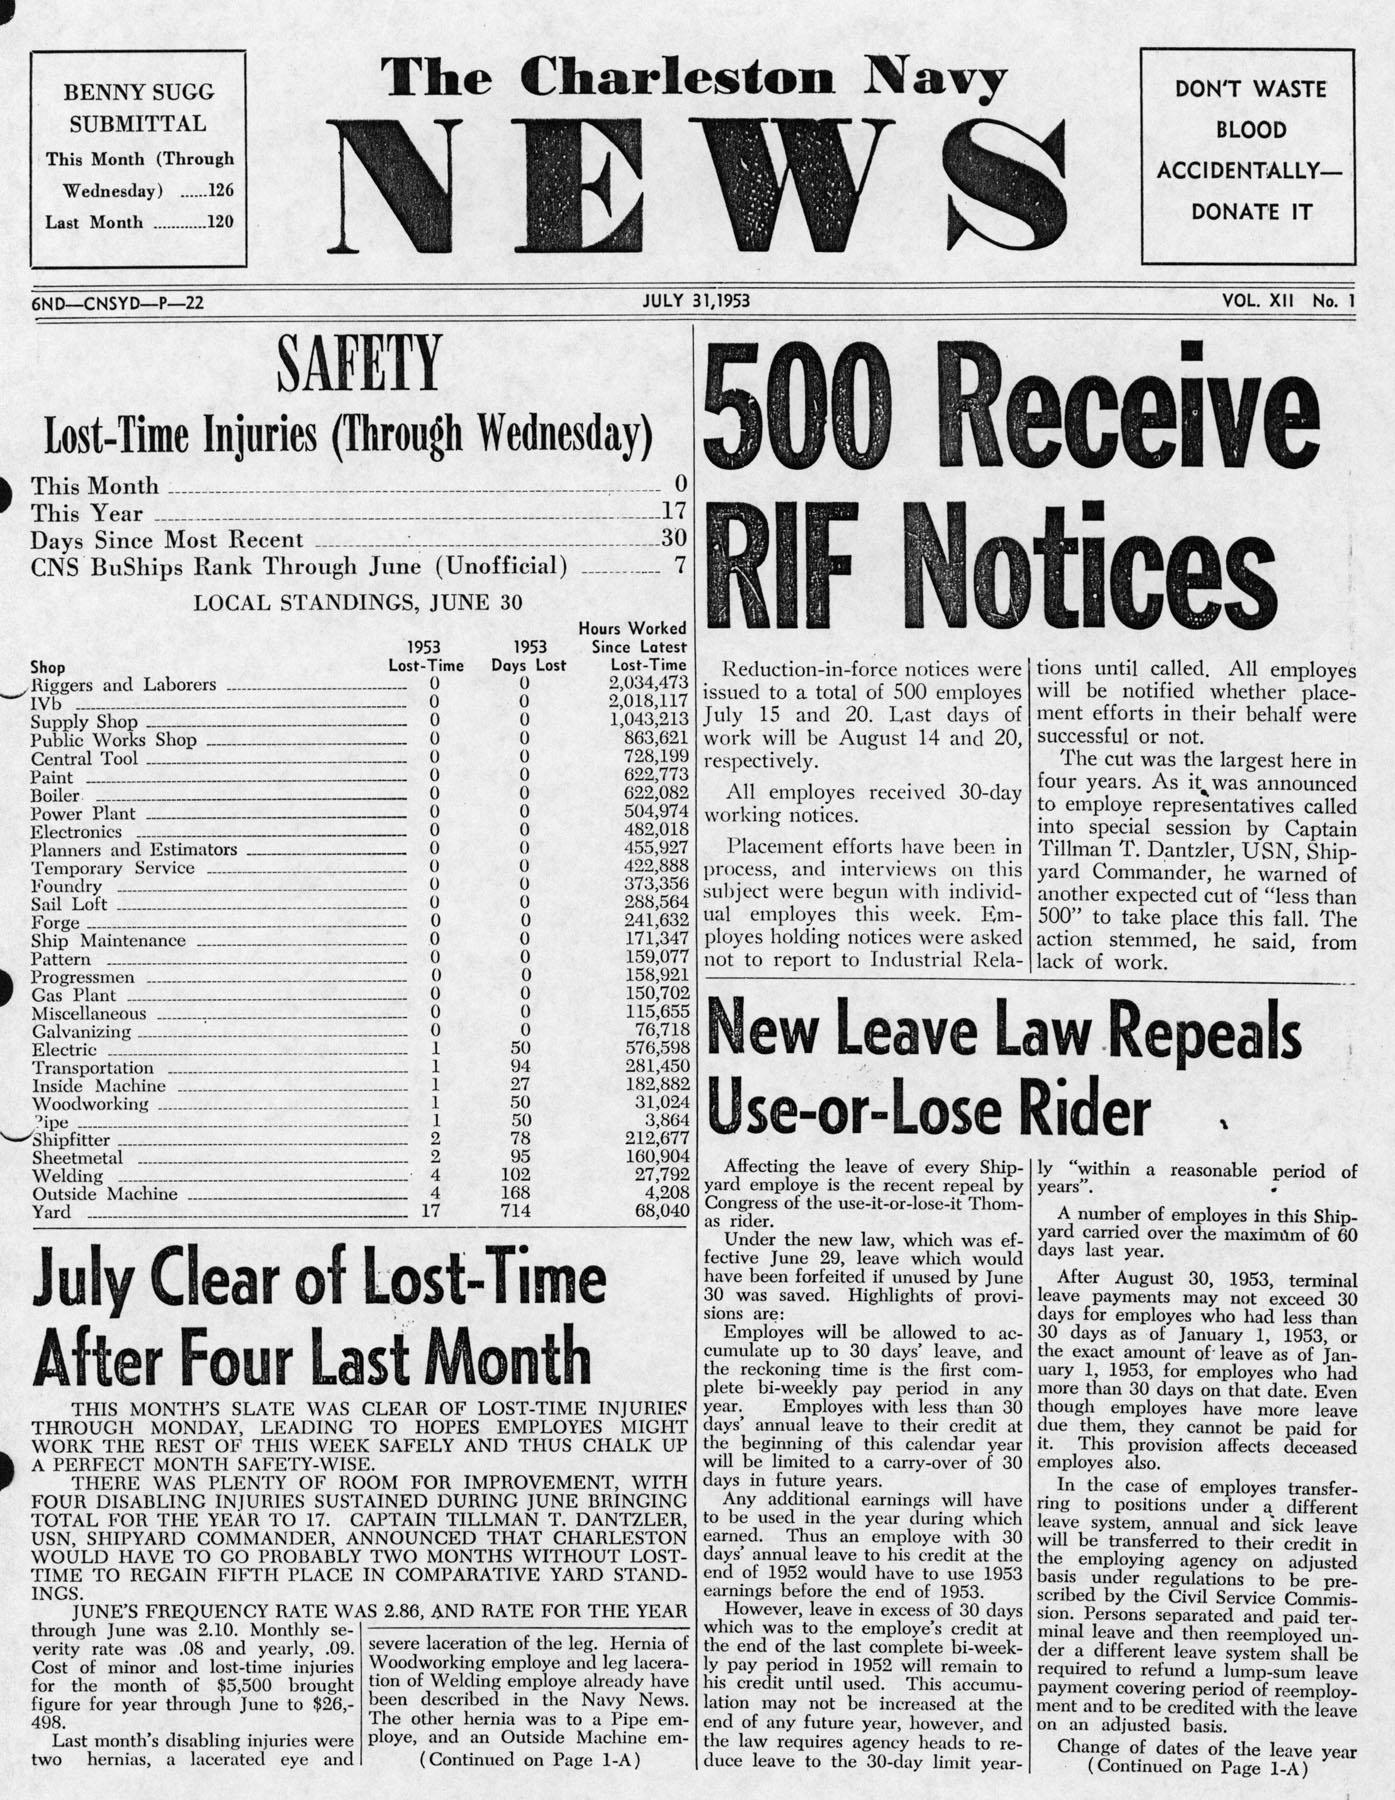 The Charleston Navy News, Volume 12, Edition 1, page i